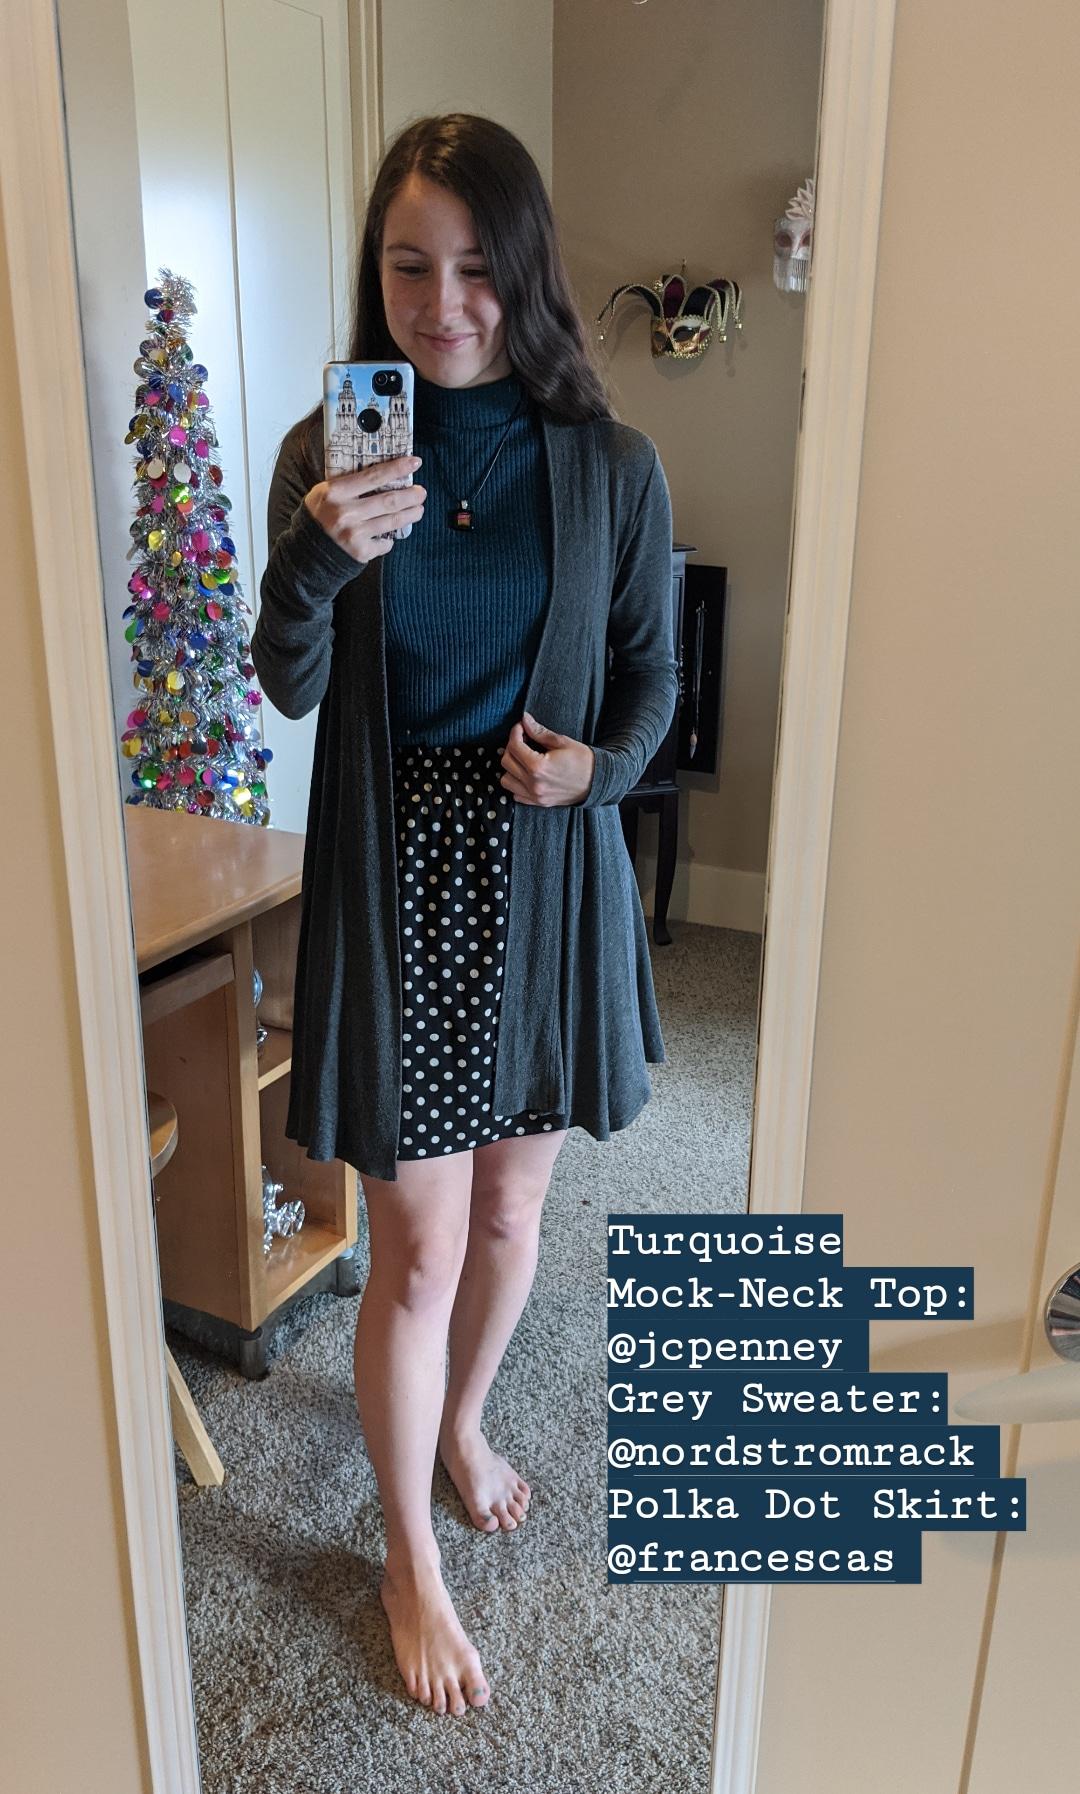 turquoise mock-neck top, grey cardigan, polka dot skirt, Francesca's